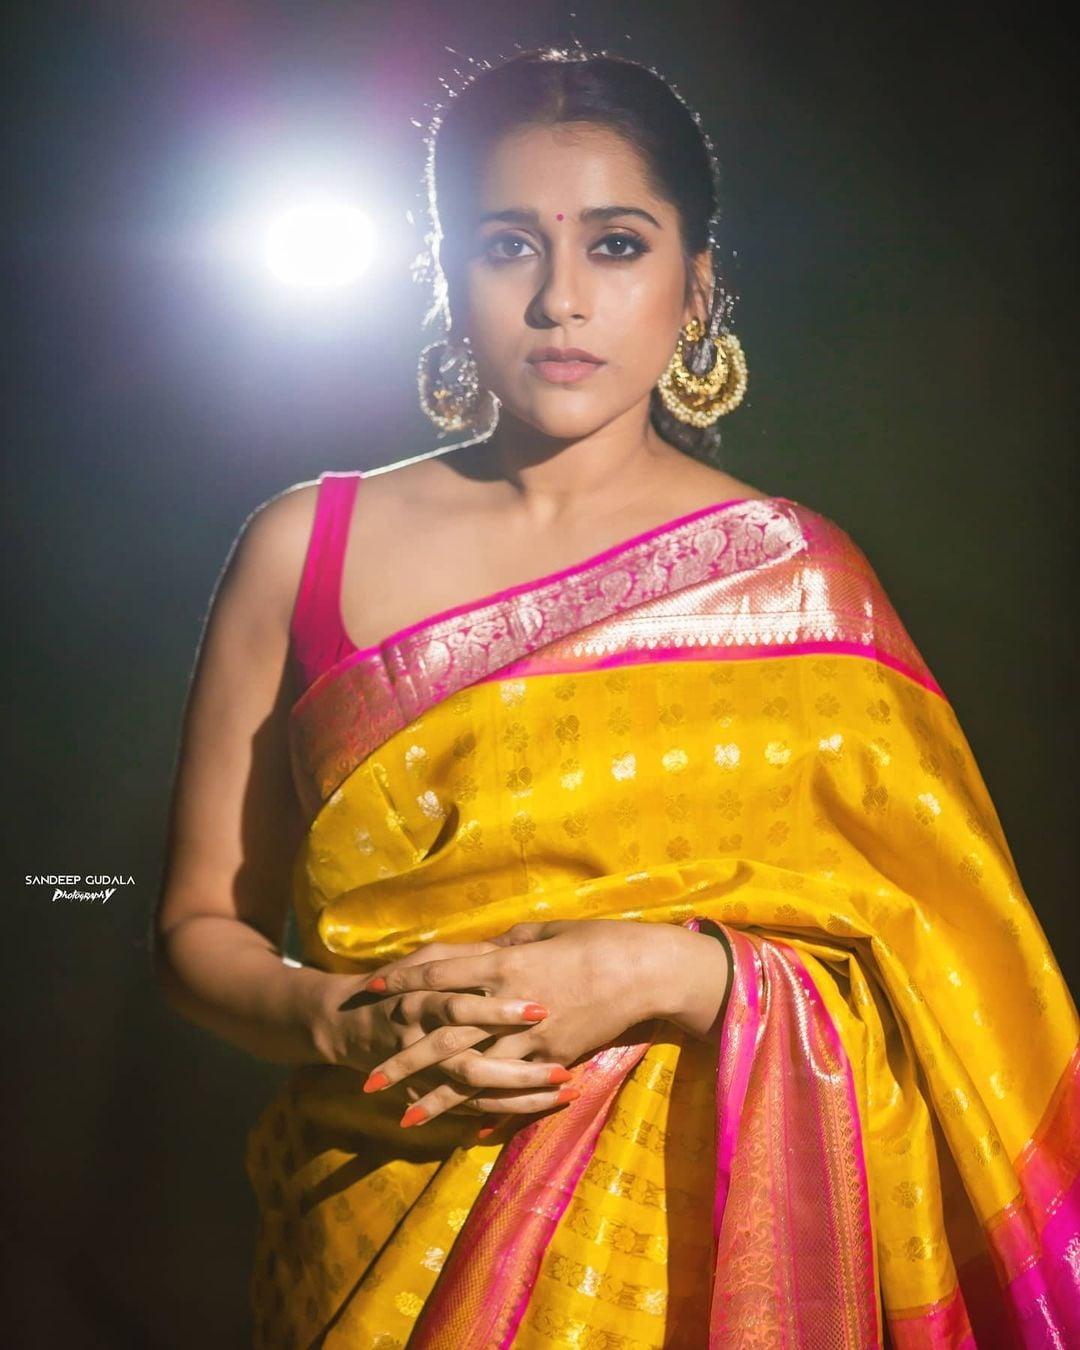 Gorgeous actress and anchor Rashmi Gautham in yellow and pink color combination kanchi pattu saree. 2021-01-09